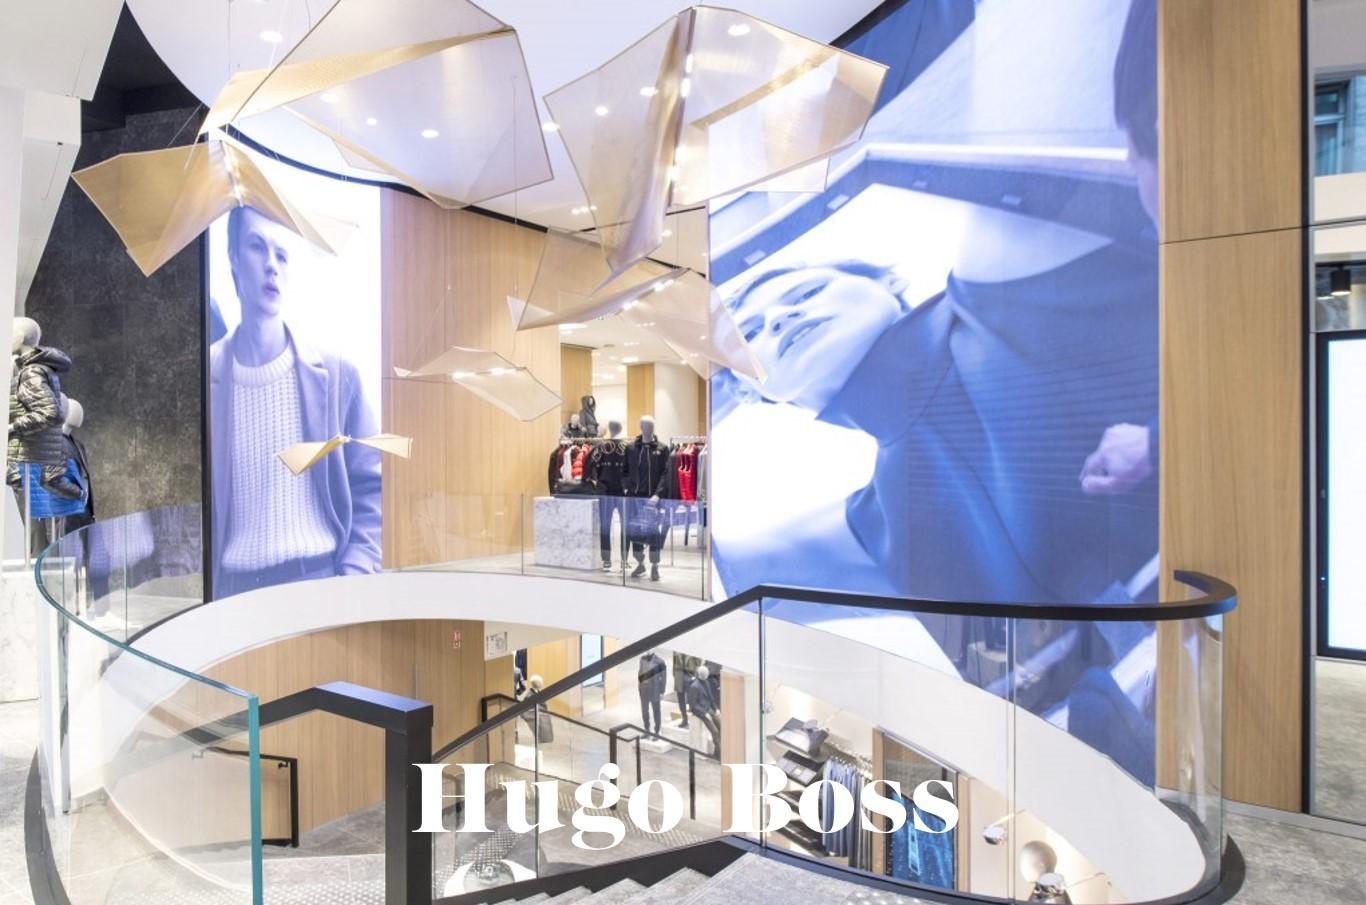 1-cover-HUGO-boss-flagship-paris-digital-retail-tour-missions-mmm